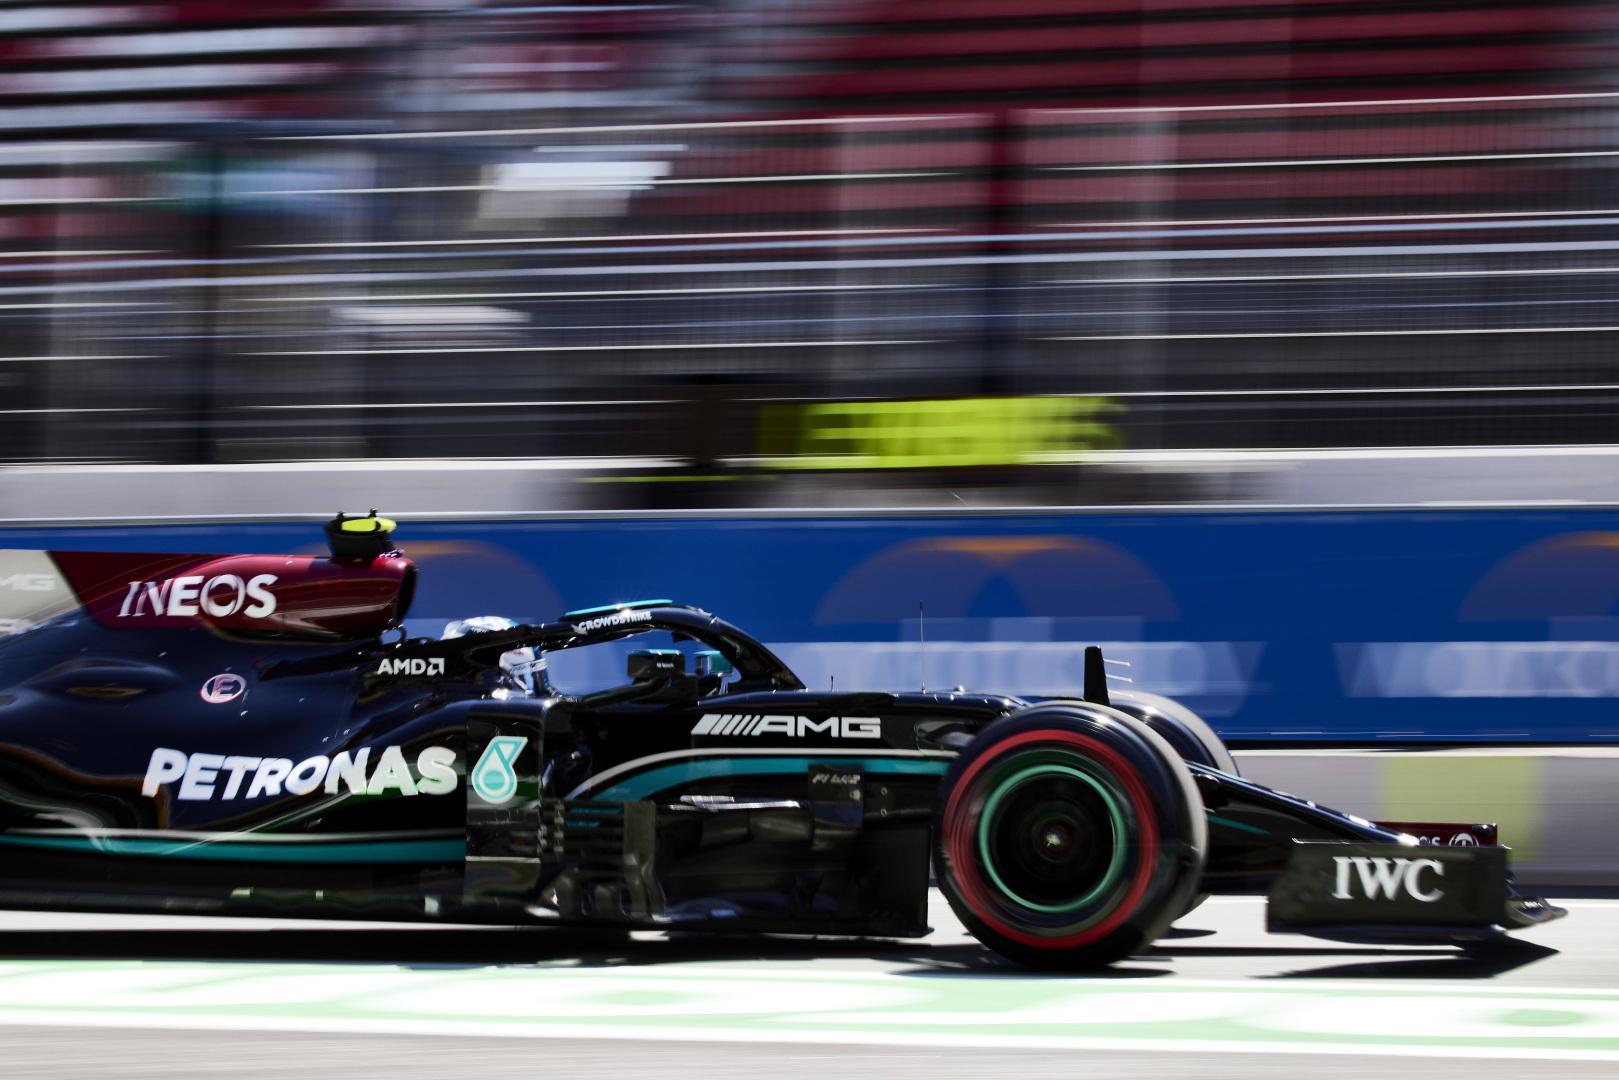 Mercedes put a £324m price on its 2020 world championship